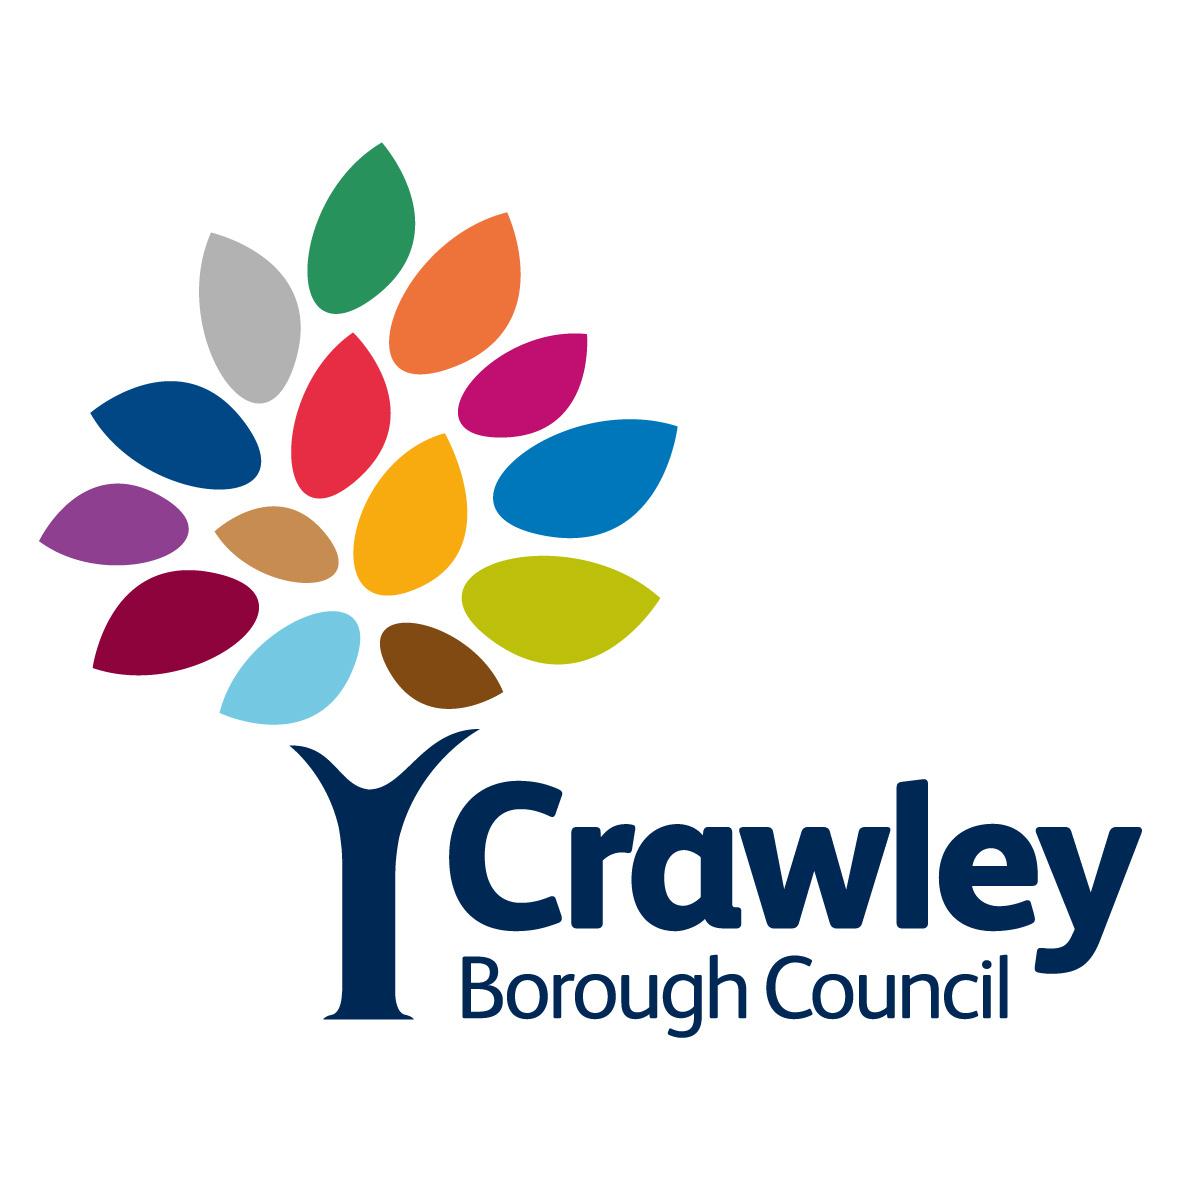 crawley_bc_logo_rgb.jpg_1181.